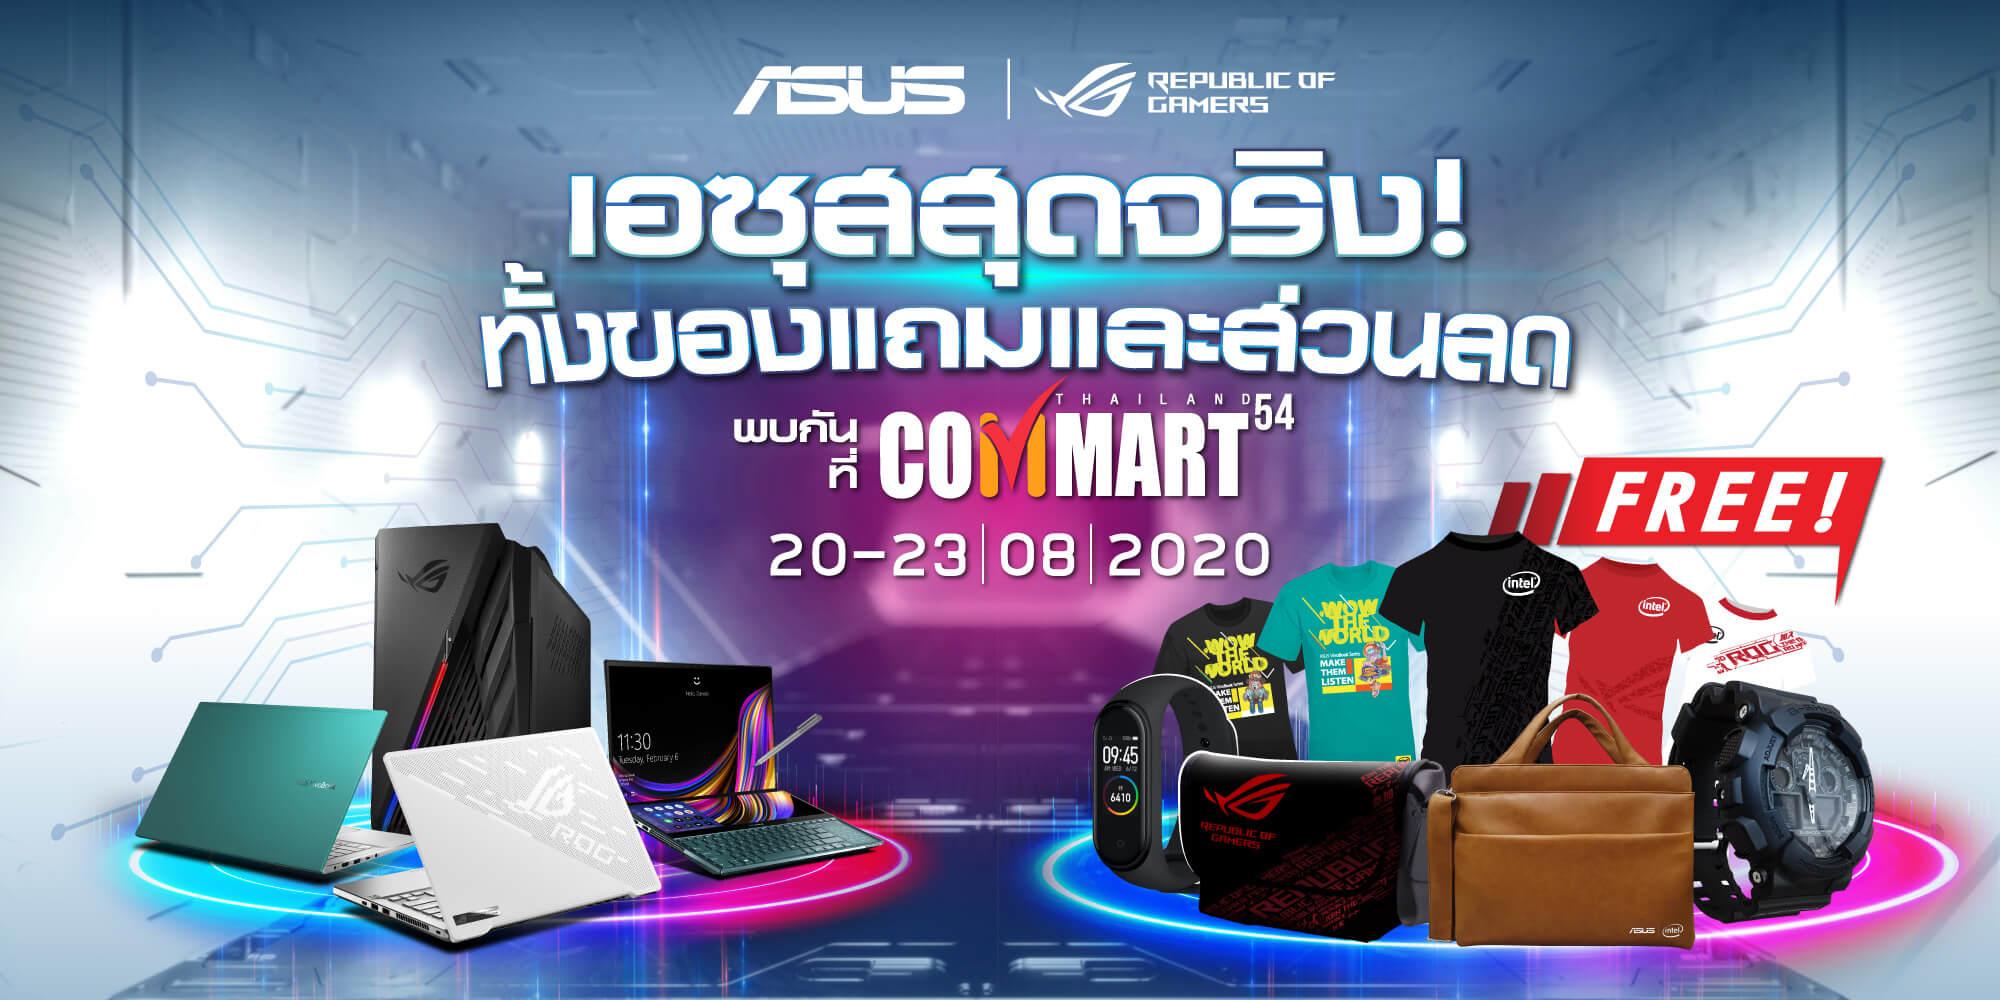 ASUS Commart Promo 2020